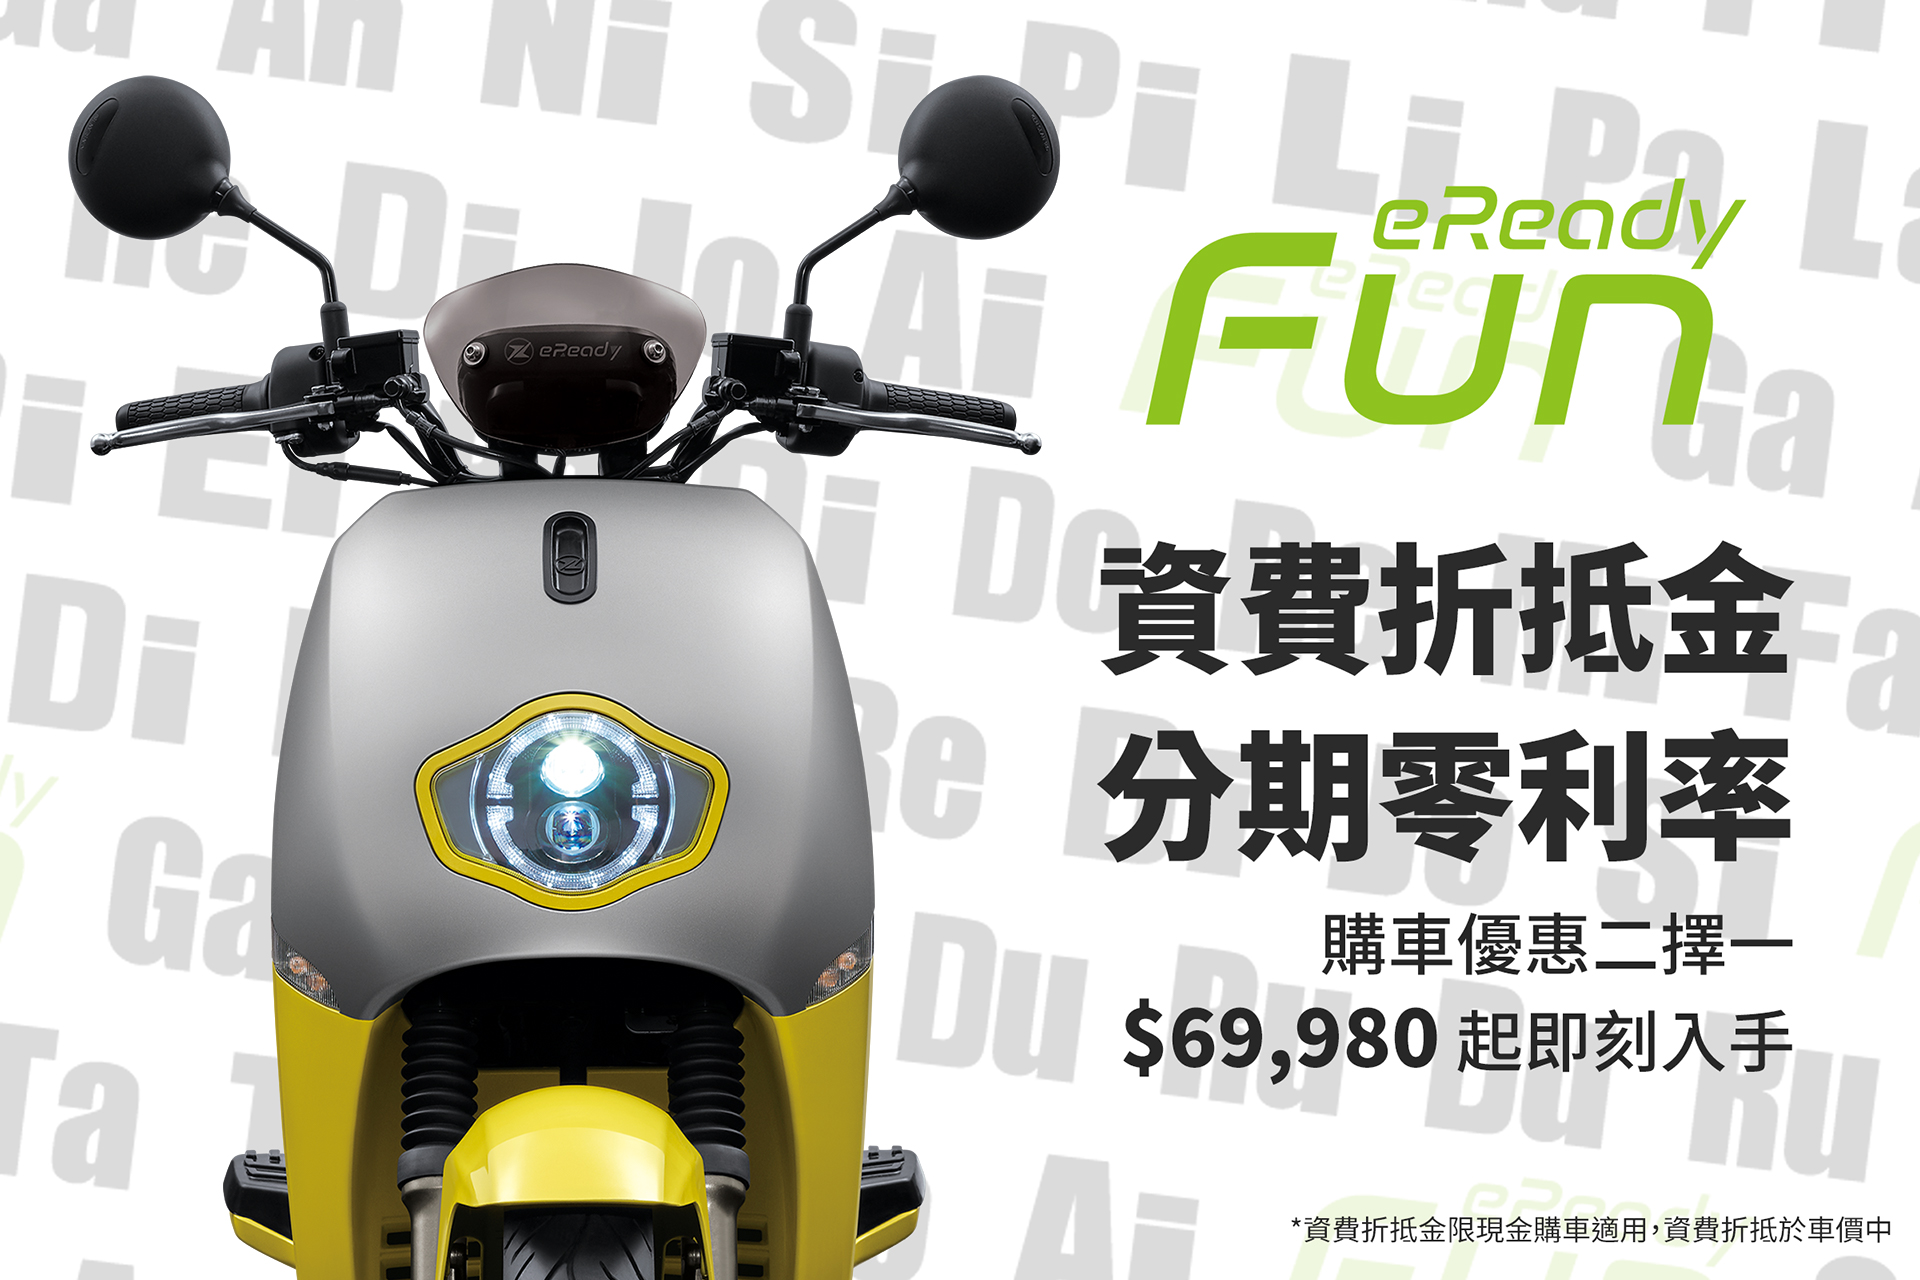 eReady Fun限時優惠69,980 放(FUN)膽騎 資費折抵金有感同行.jpg